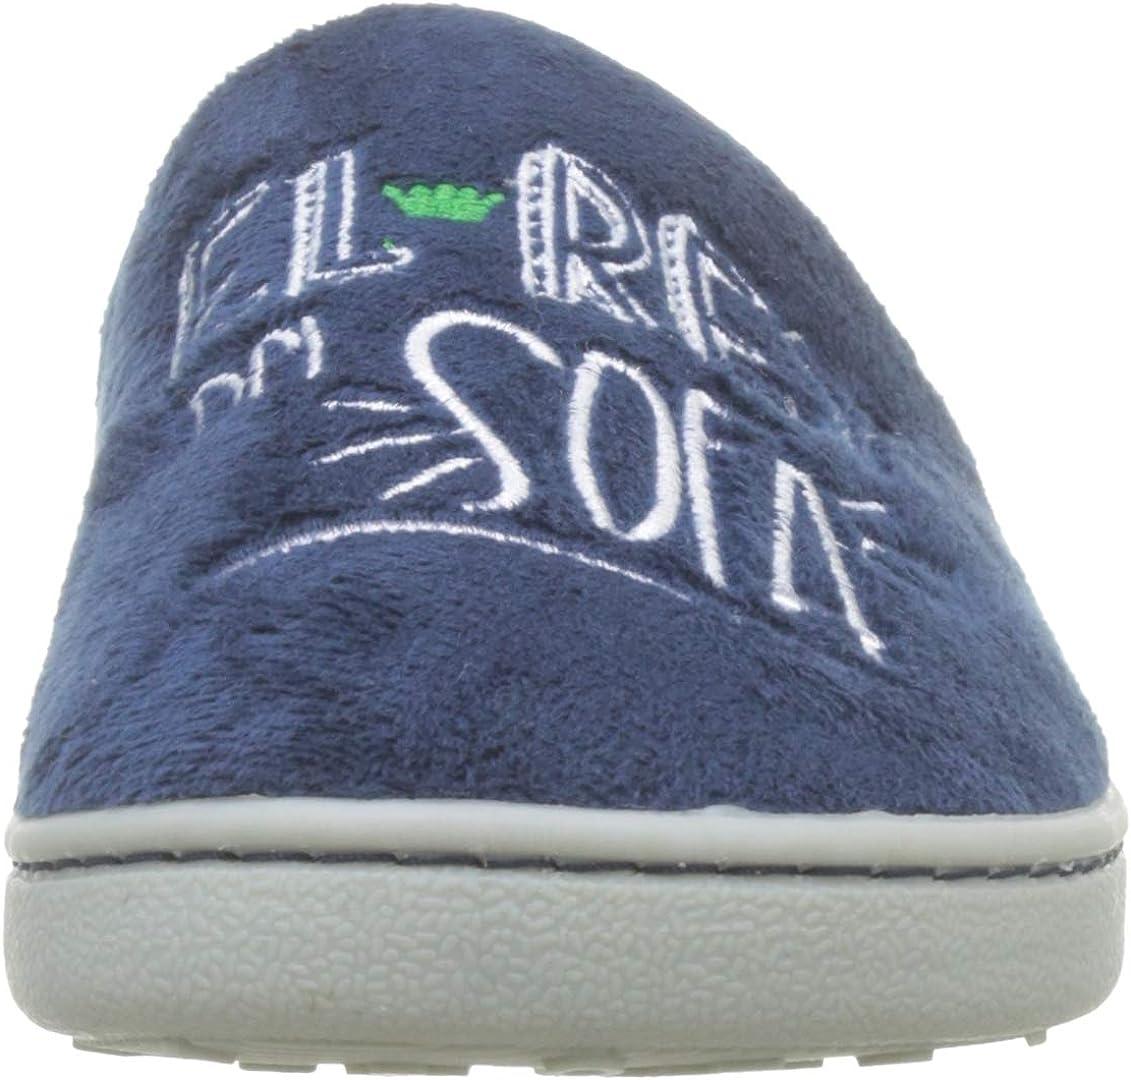 GIOSEPPO 56020 Zapatillas de Estar por casa con tal/ón Abierto para Ni/ños